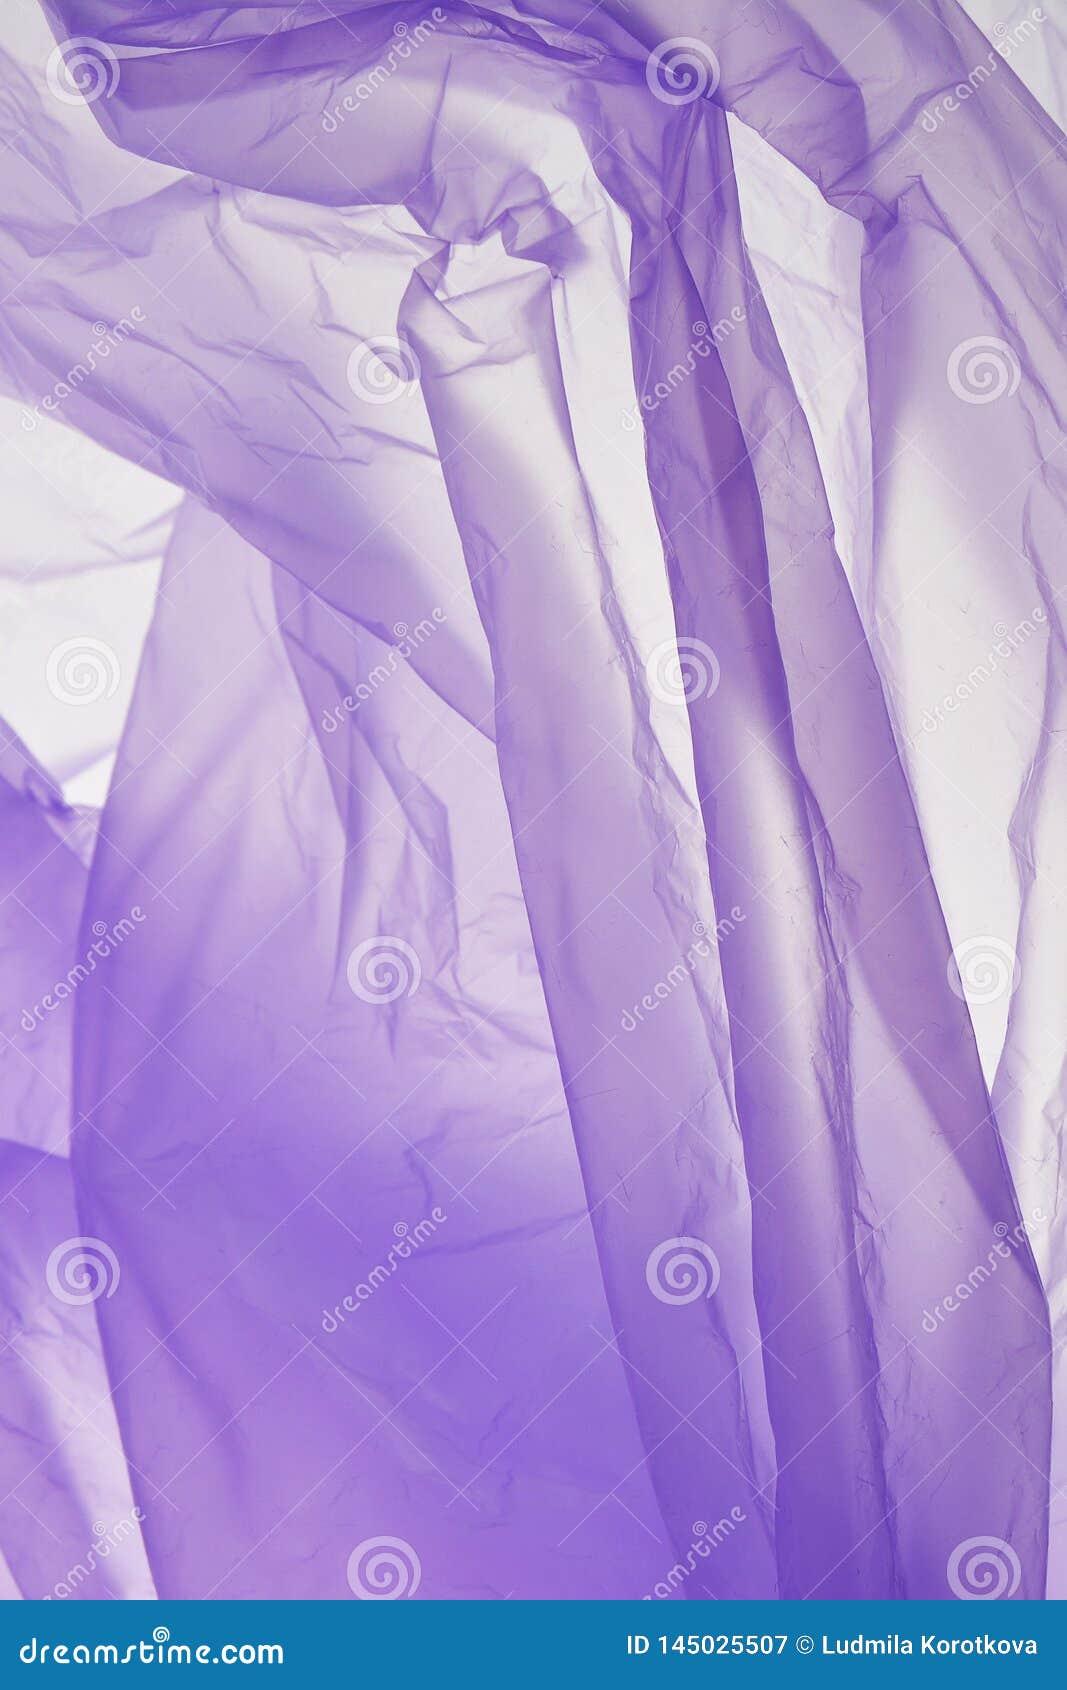 Plastikowego worka t?o Abstrakta ?wiat?o - purpura cieni akwareli t?o Textured kanwa dla projekta, karciany szablon ocenia?